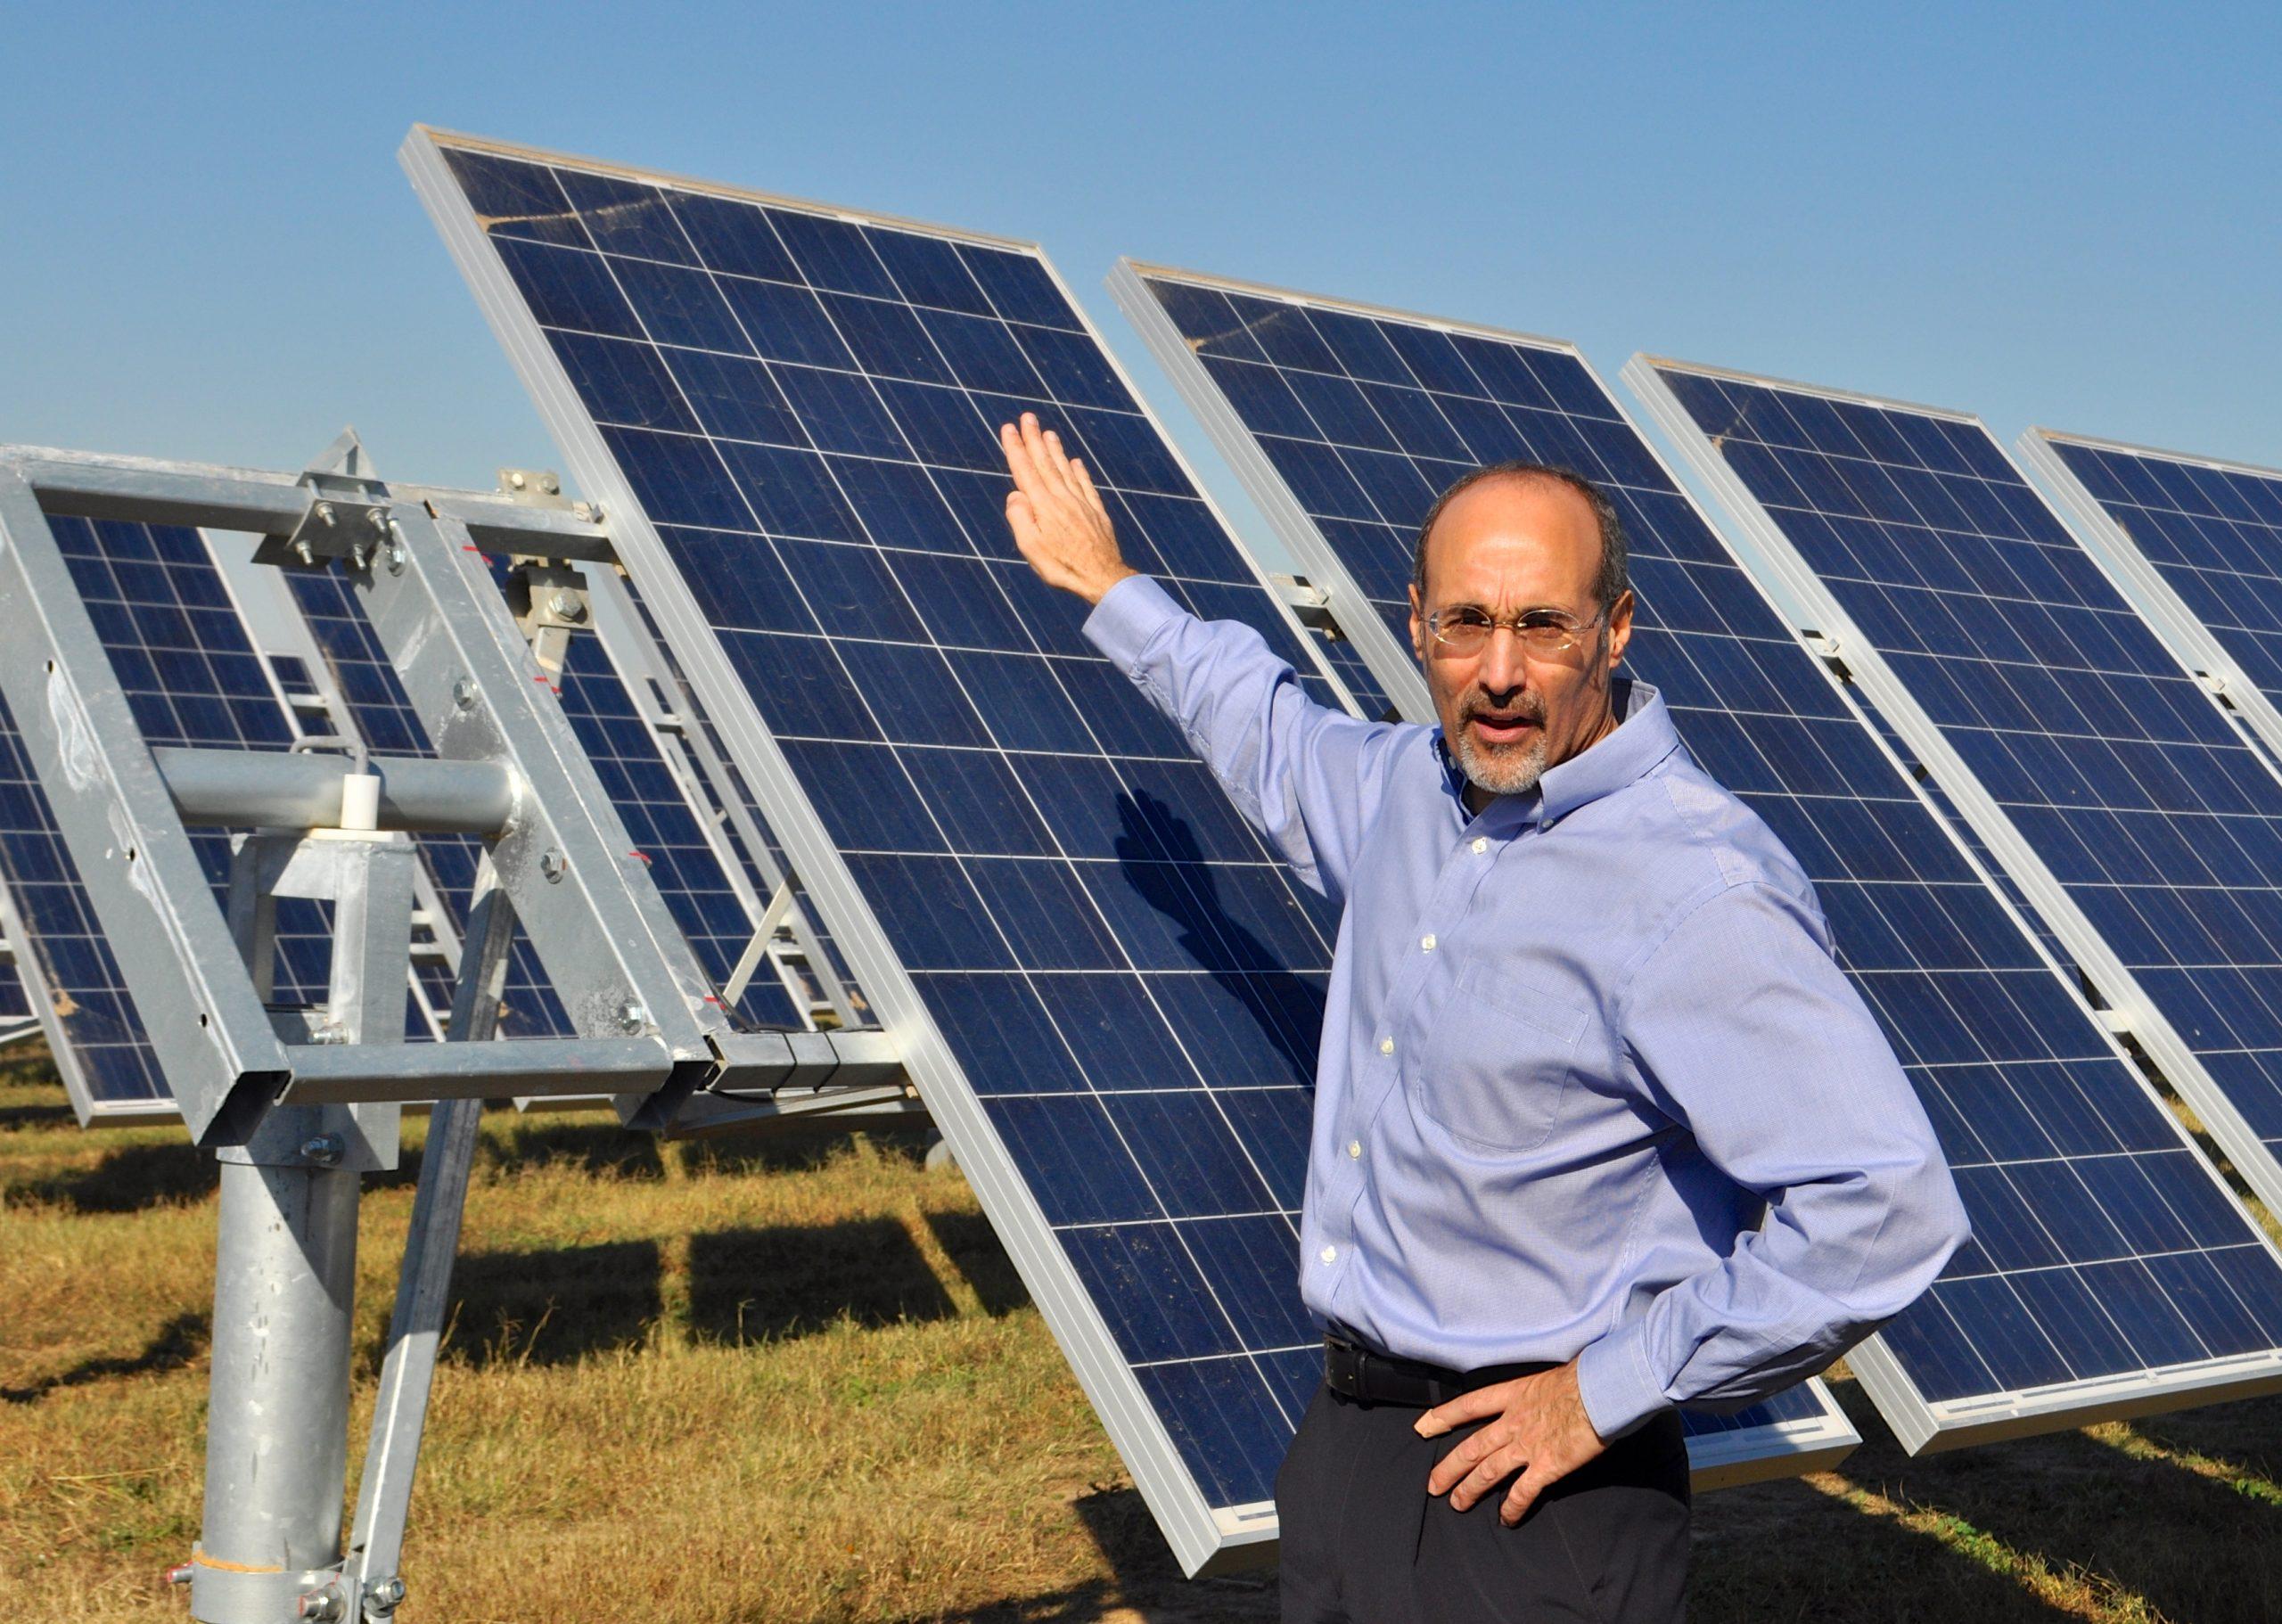 OCI Solar Power President and CEO Tony Dorazio